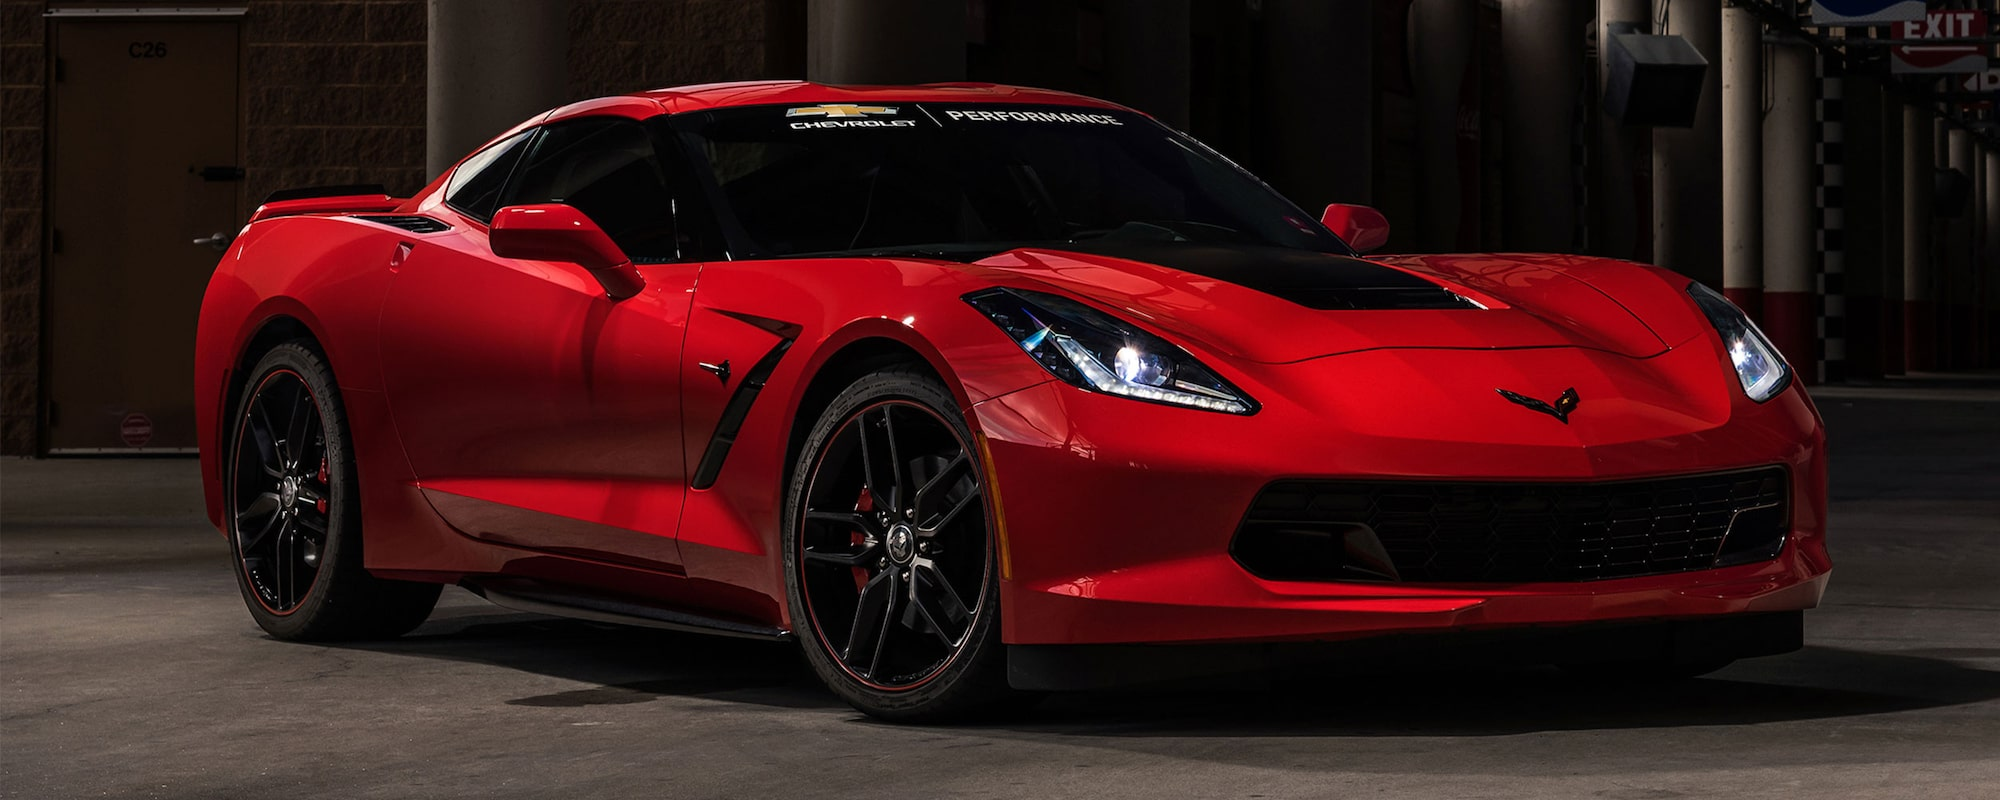 hight resolution of 2017 chevrolet corvette sports car vehicle upgrades